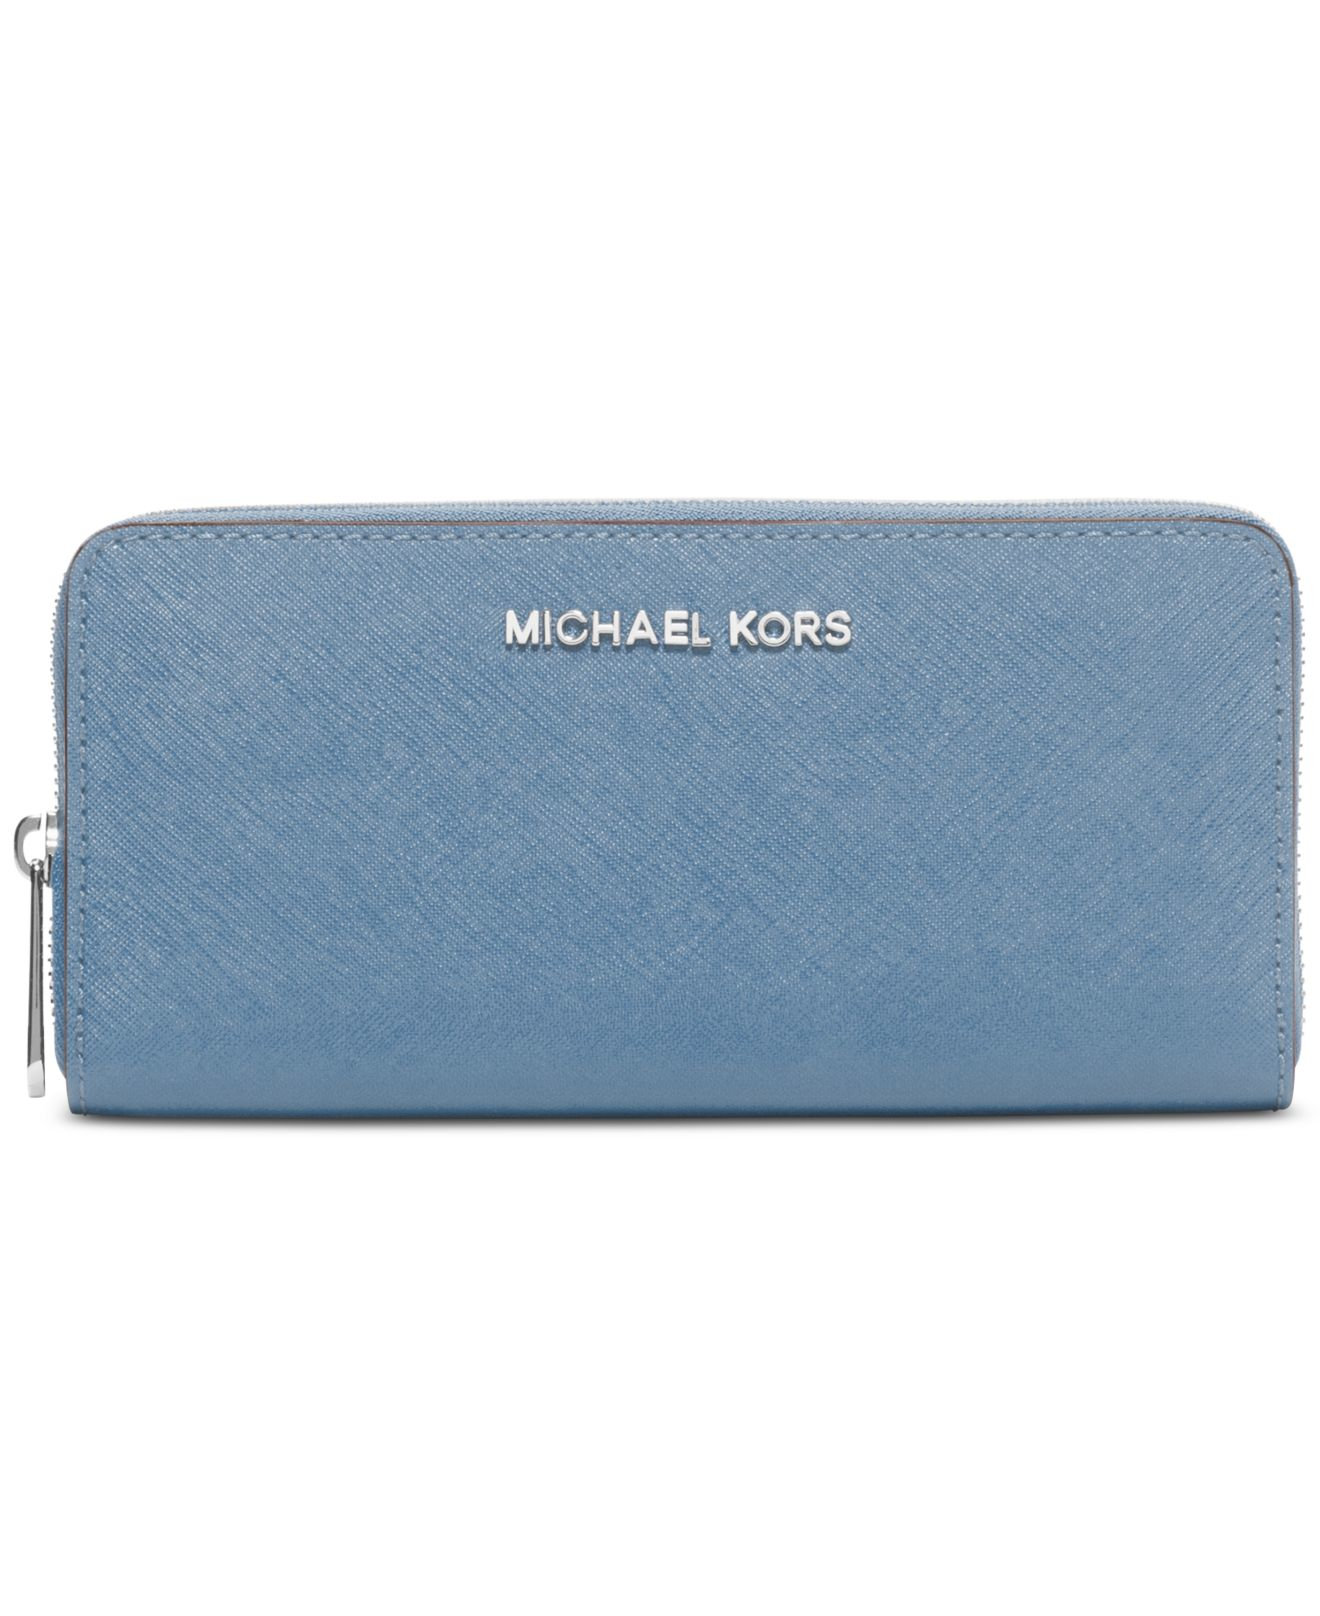 0d478164080c michael kors blue wallets blakeley rain boot - Marwood VeneerMarwood ...